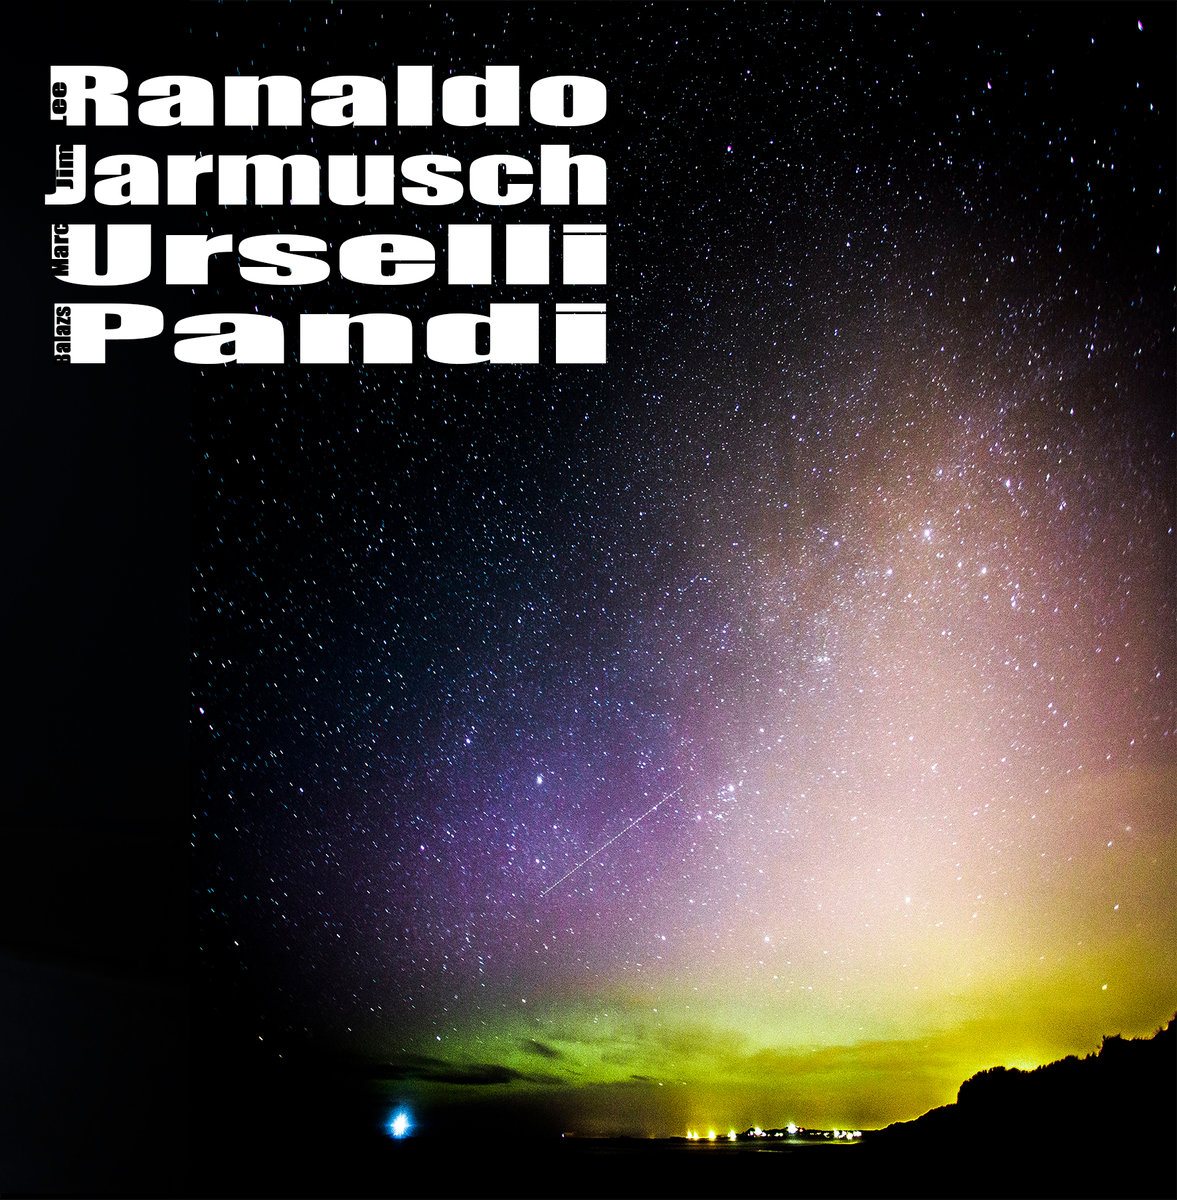 Lee Ranaldo, Jim Jarmusch, Marc Urselli, and Balazs Pandi .jpg